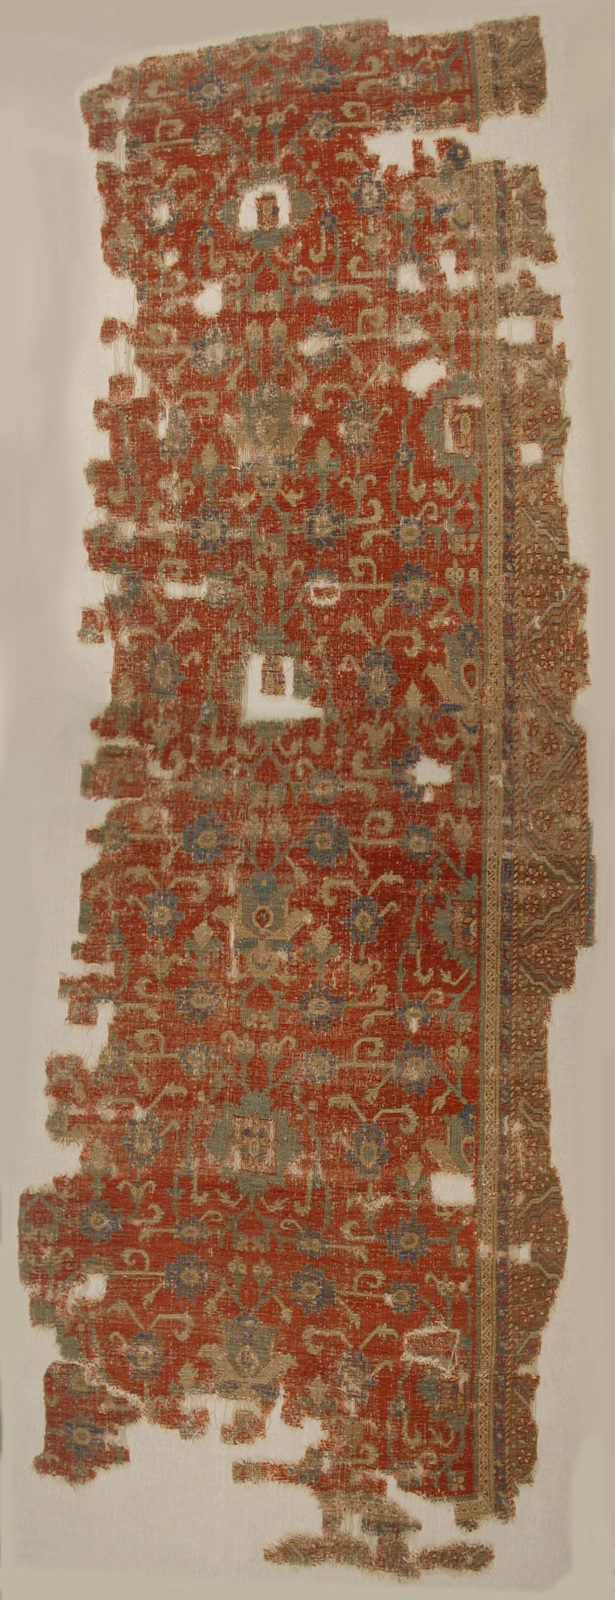 Carpet with Chintimani Border and Lotus Design